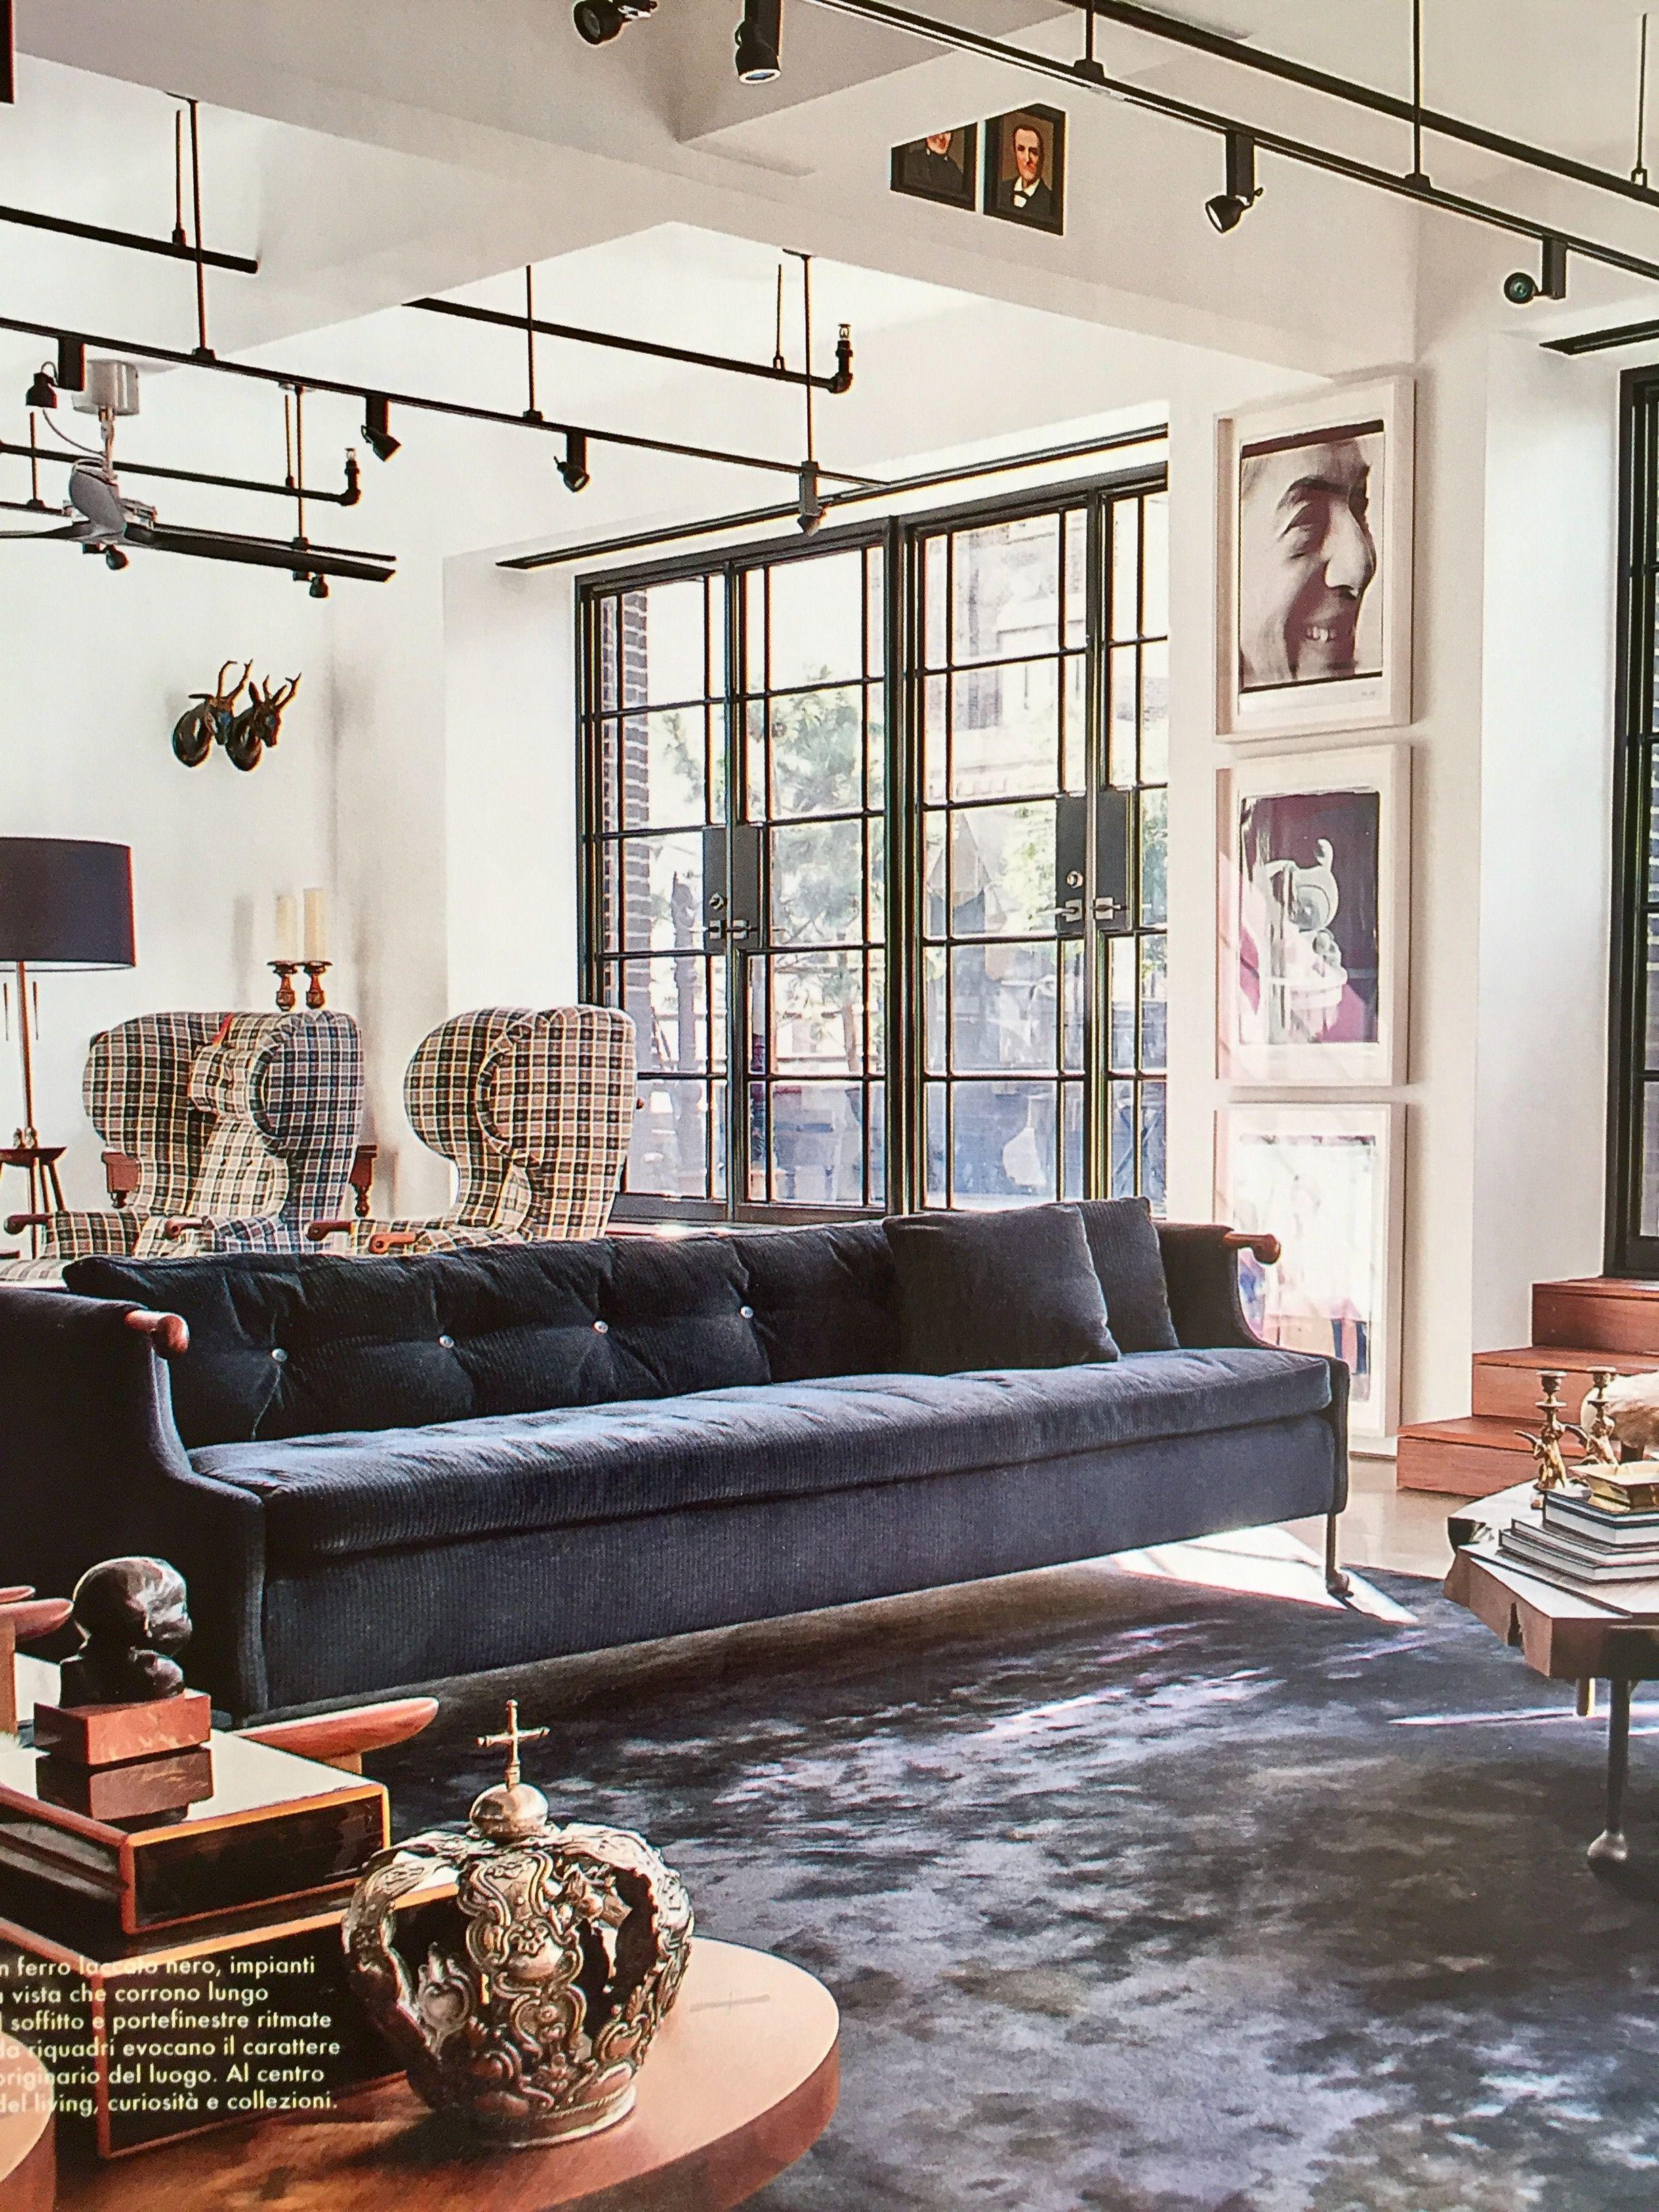 Industrial Design Ideas What You Re Looking For Your Interior Designer S Projects Stunning Ligh Apartment Interior Design Elegant Living Room Interior Design